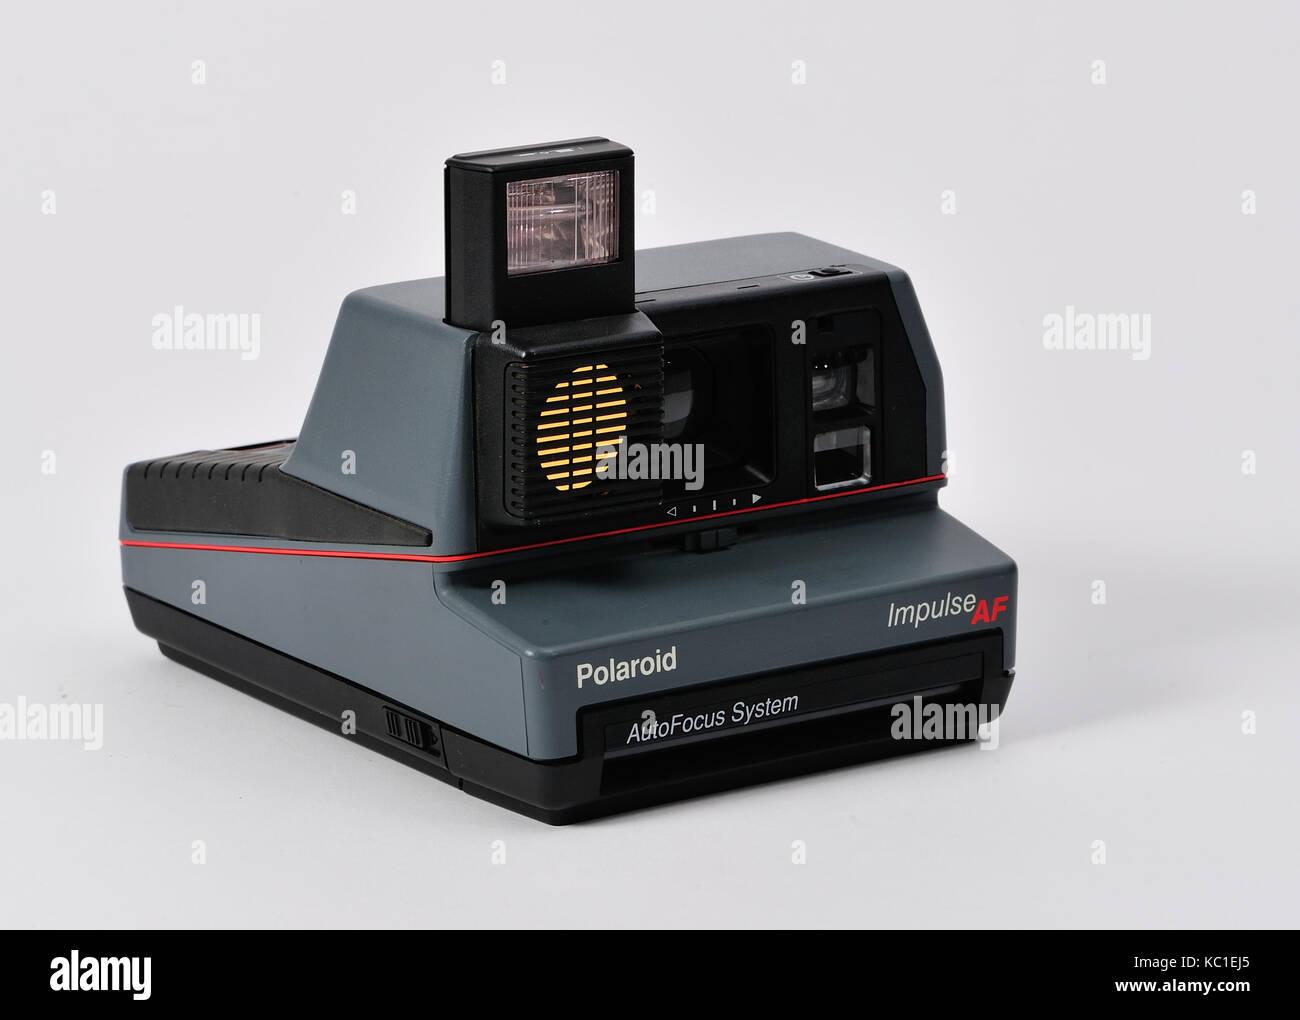 vintage polaroid land camera with instruction manual and box stock rh alamy com Polaroid Impulse QPS Impulse Purple Polaroid Camera